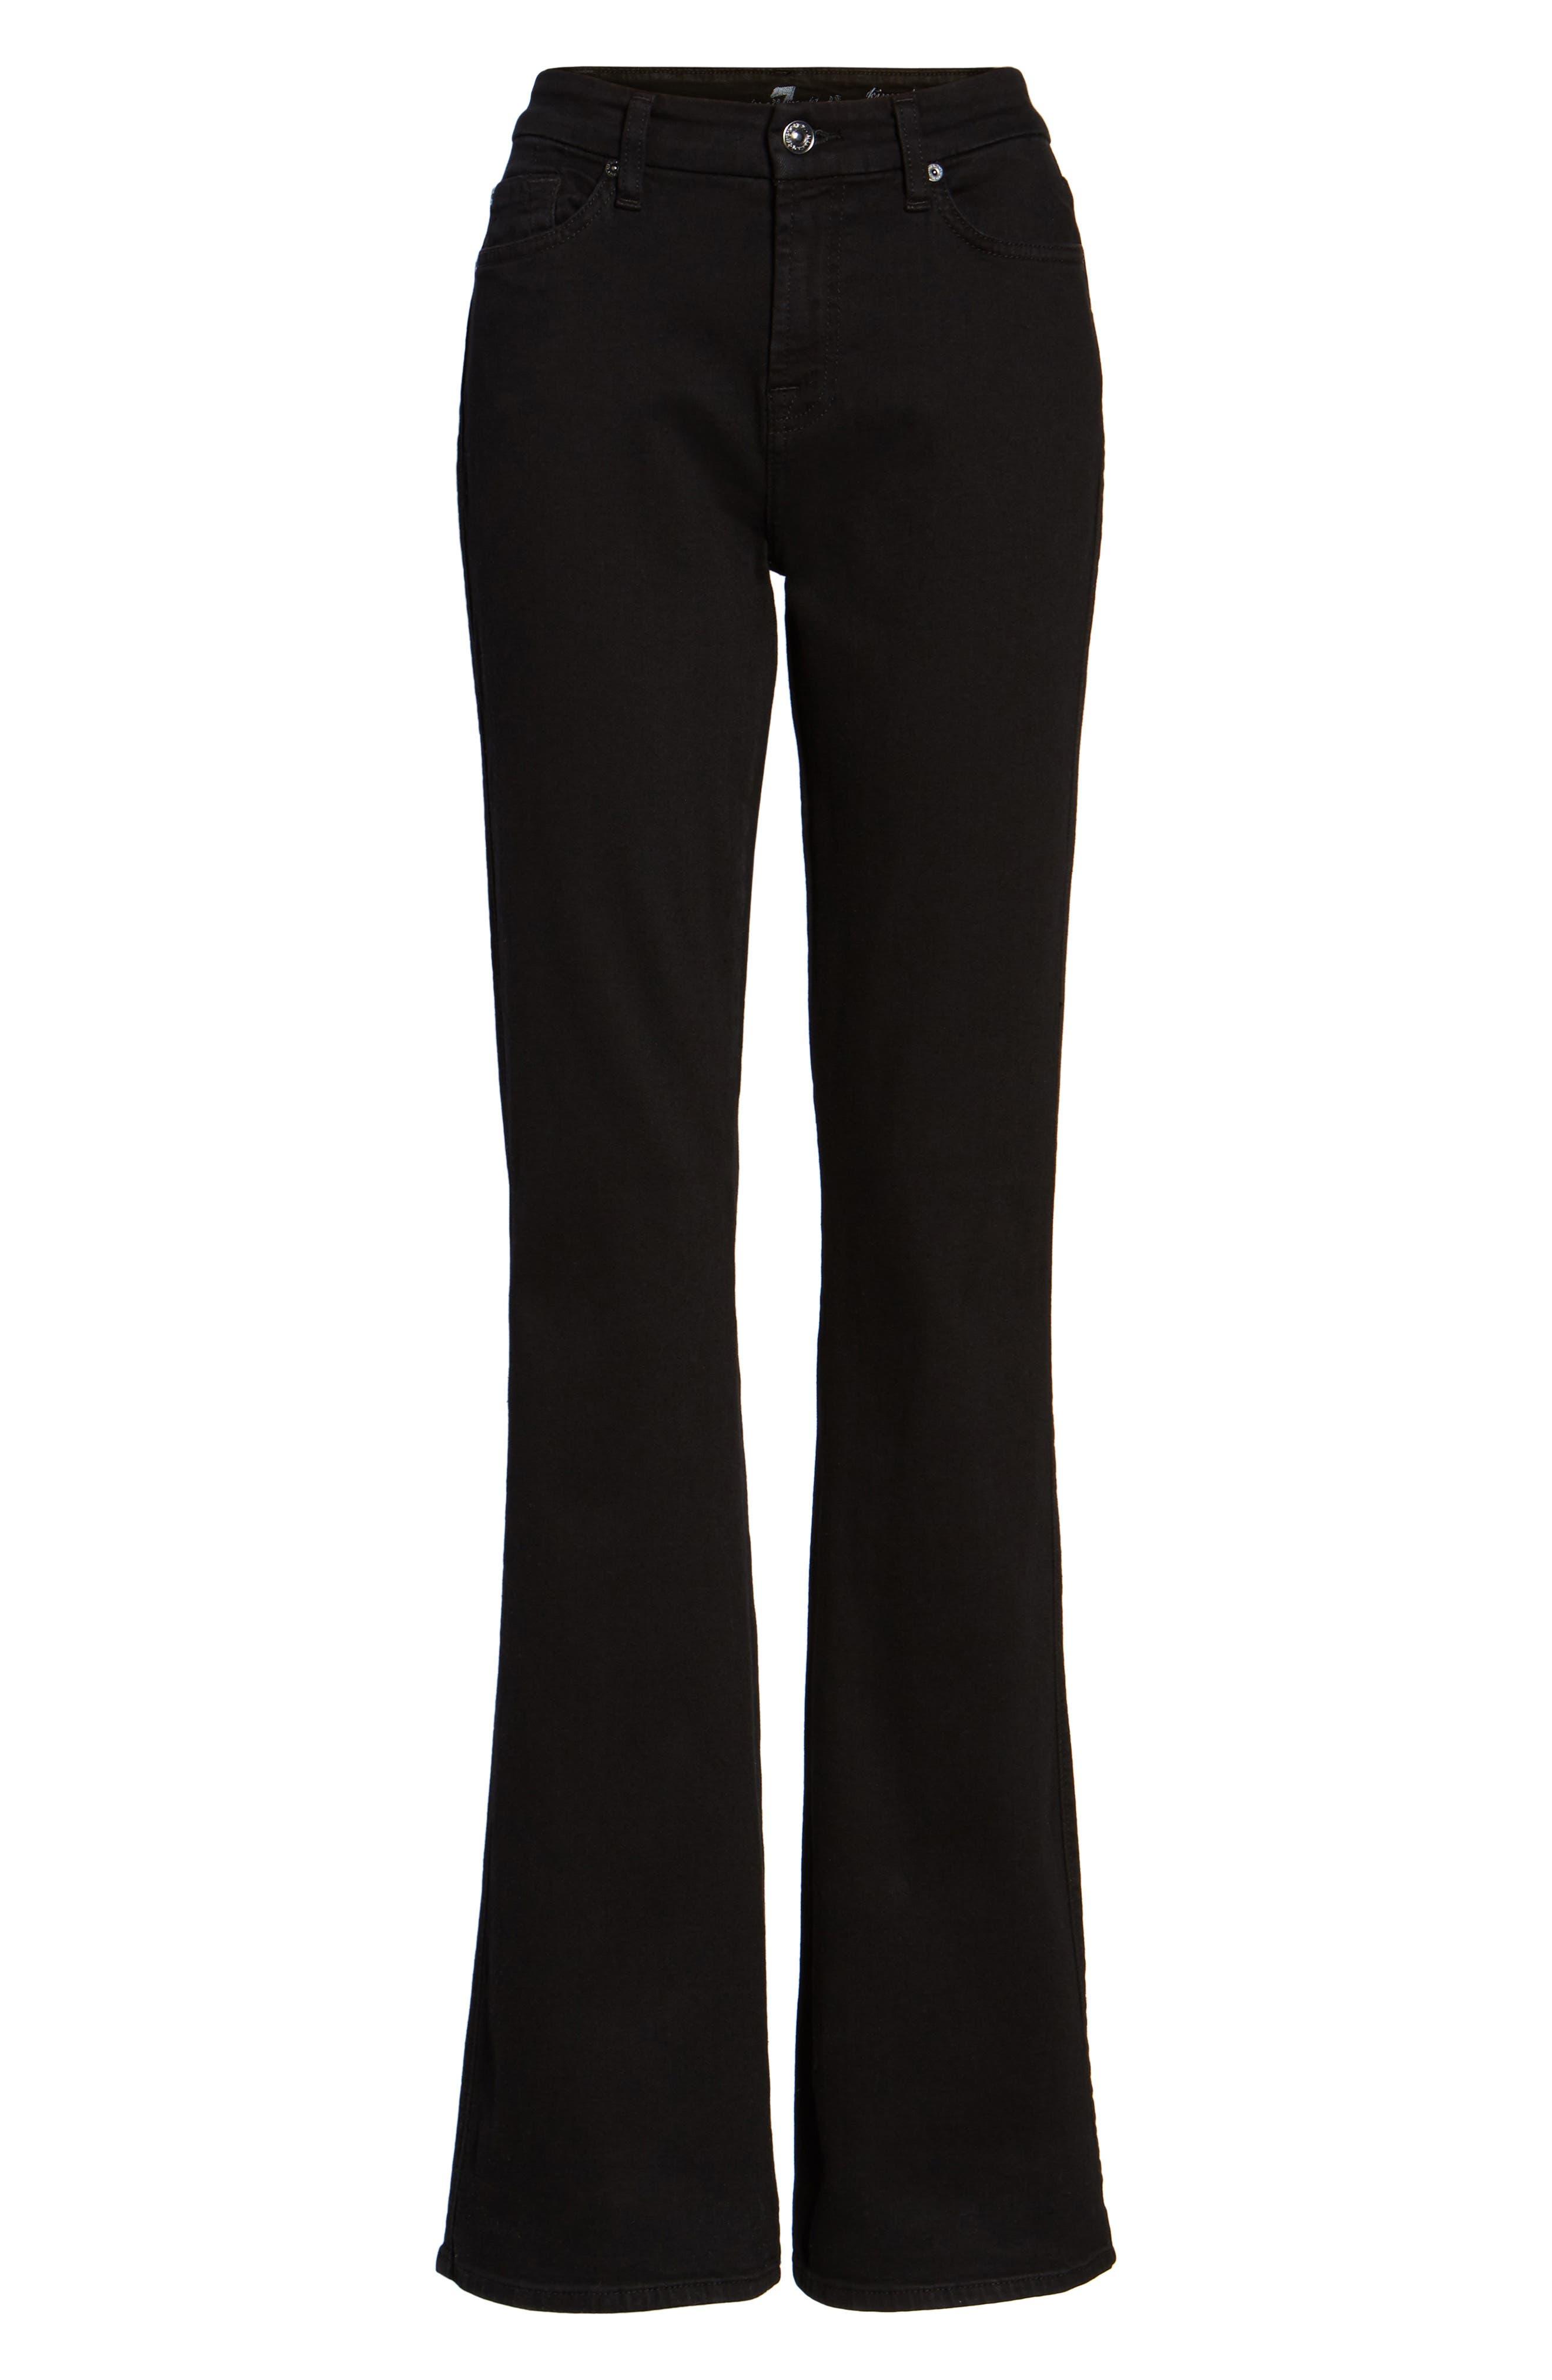 'Kimmie' Bootcut Jeans,                             Alternate thumbnail 2, color,